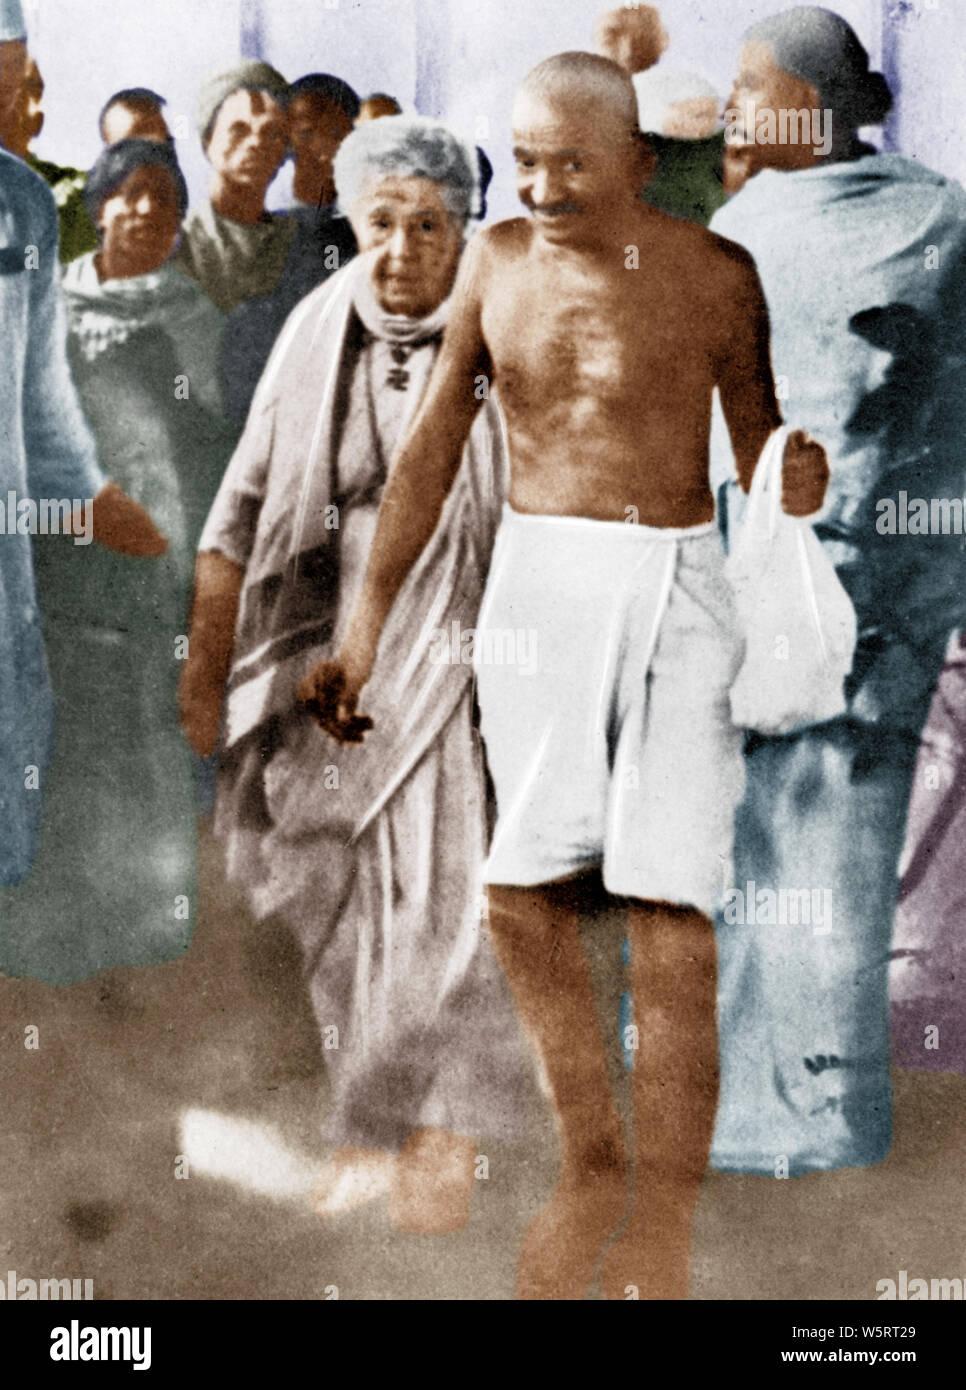 Mahatma Gandhi avec Annie Besant Madras Tamil Nadu Inde Asie Septembre 1921 Banque D'Images